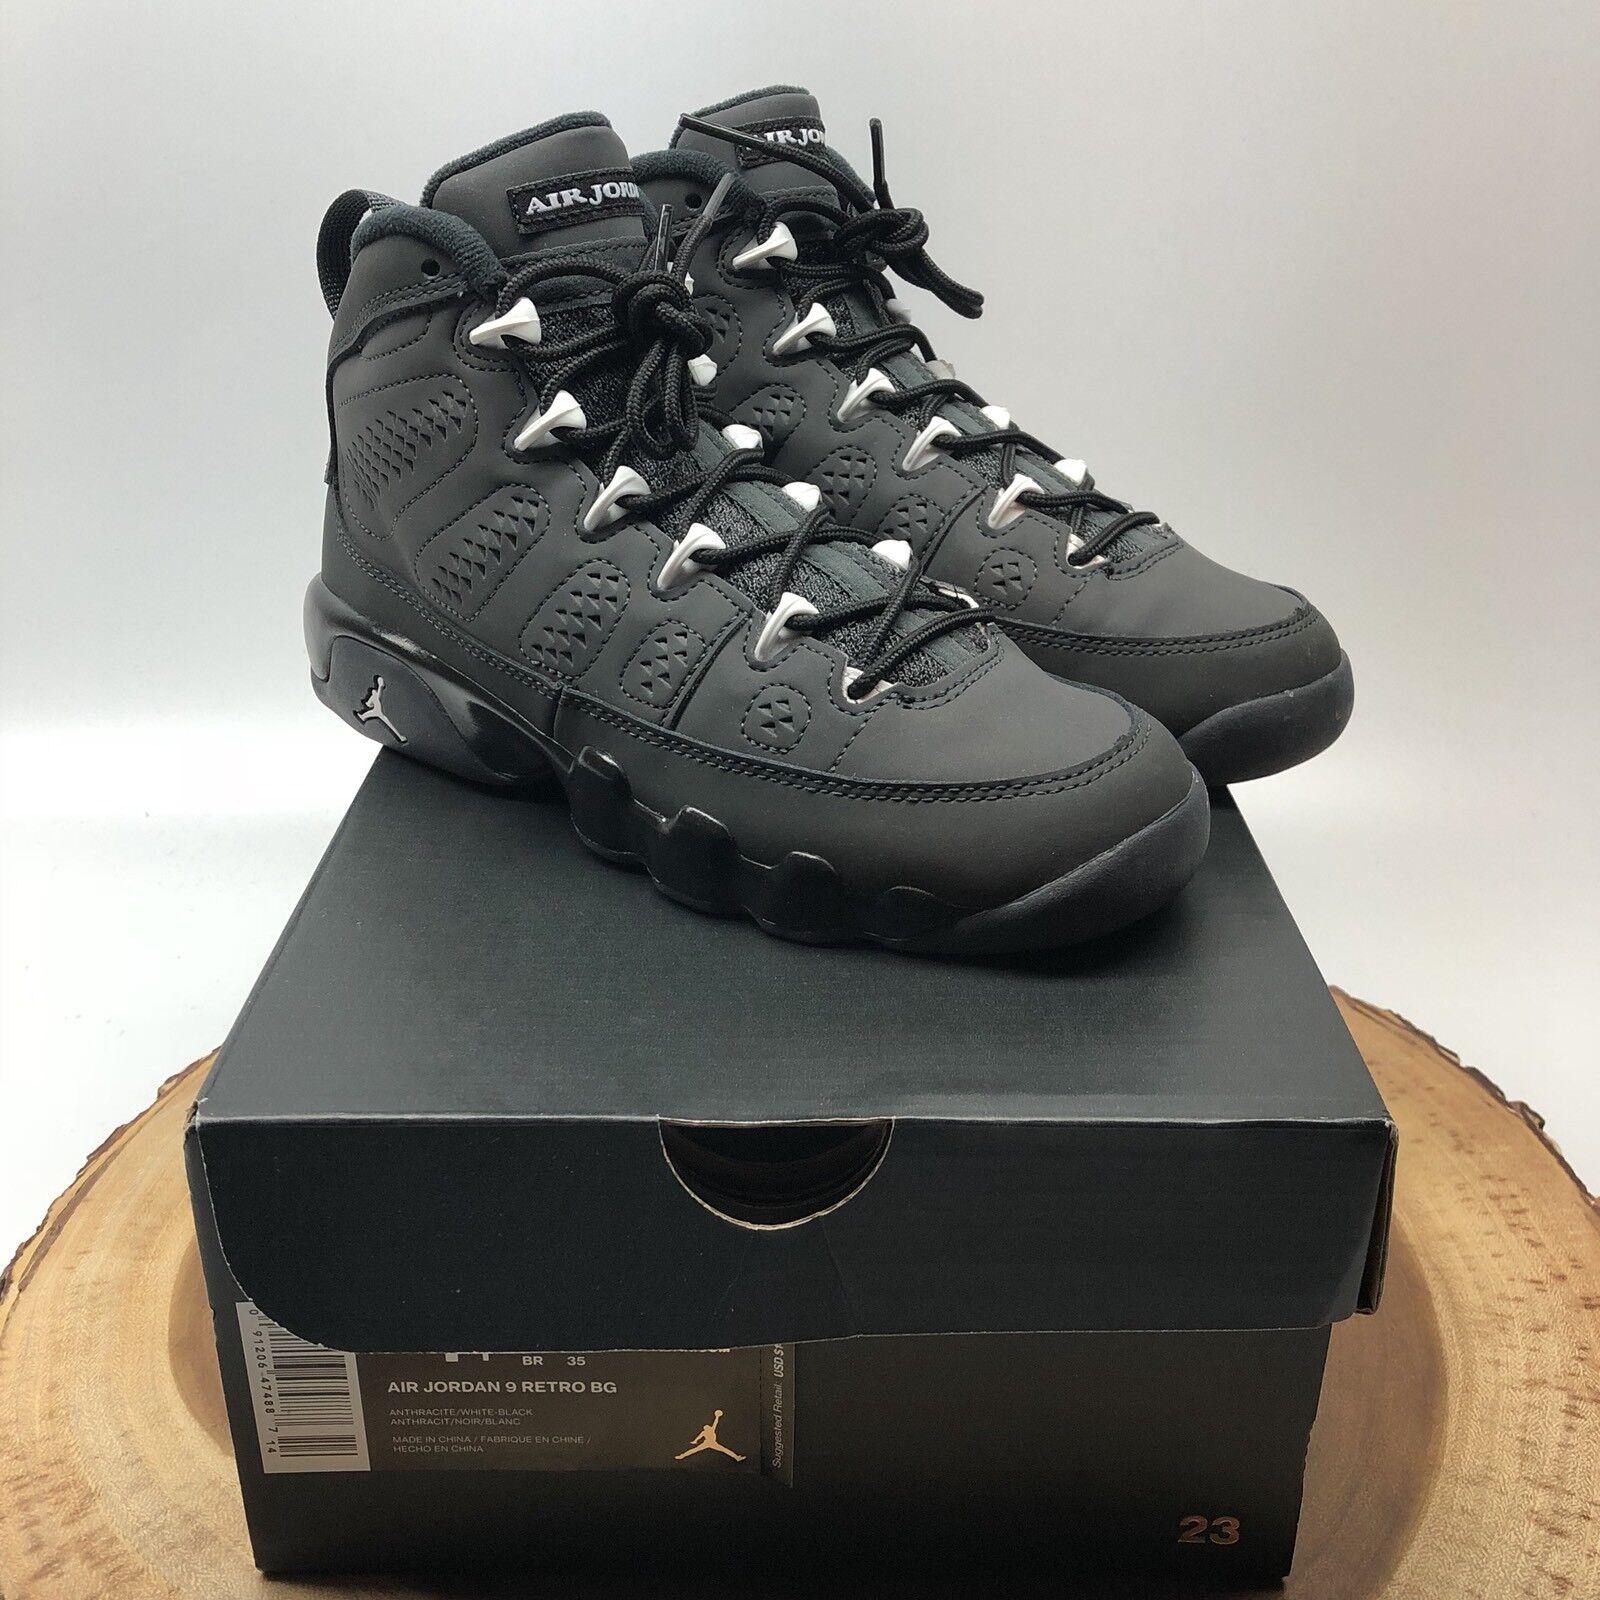 Nike Air Jordan Retro IX Antracite Black White 302359 013 Size 4.5 V VI VII X XI